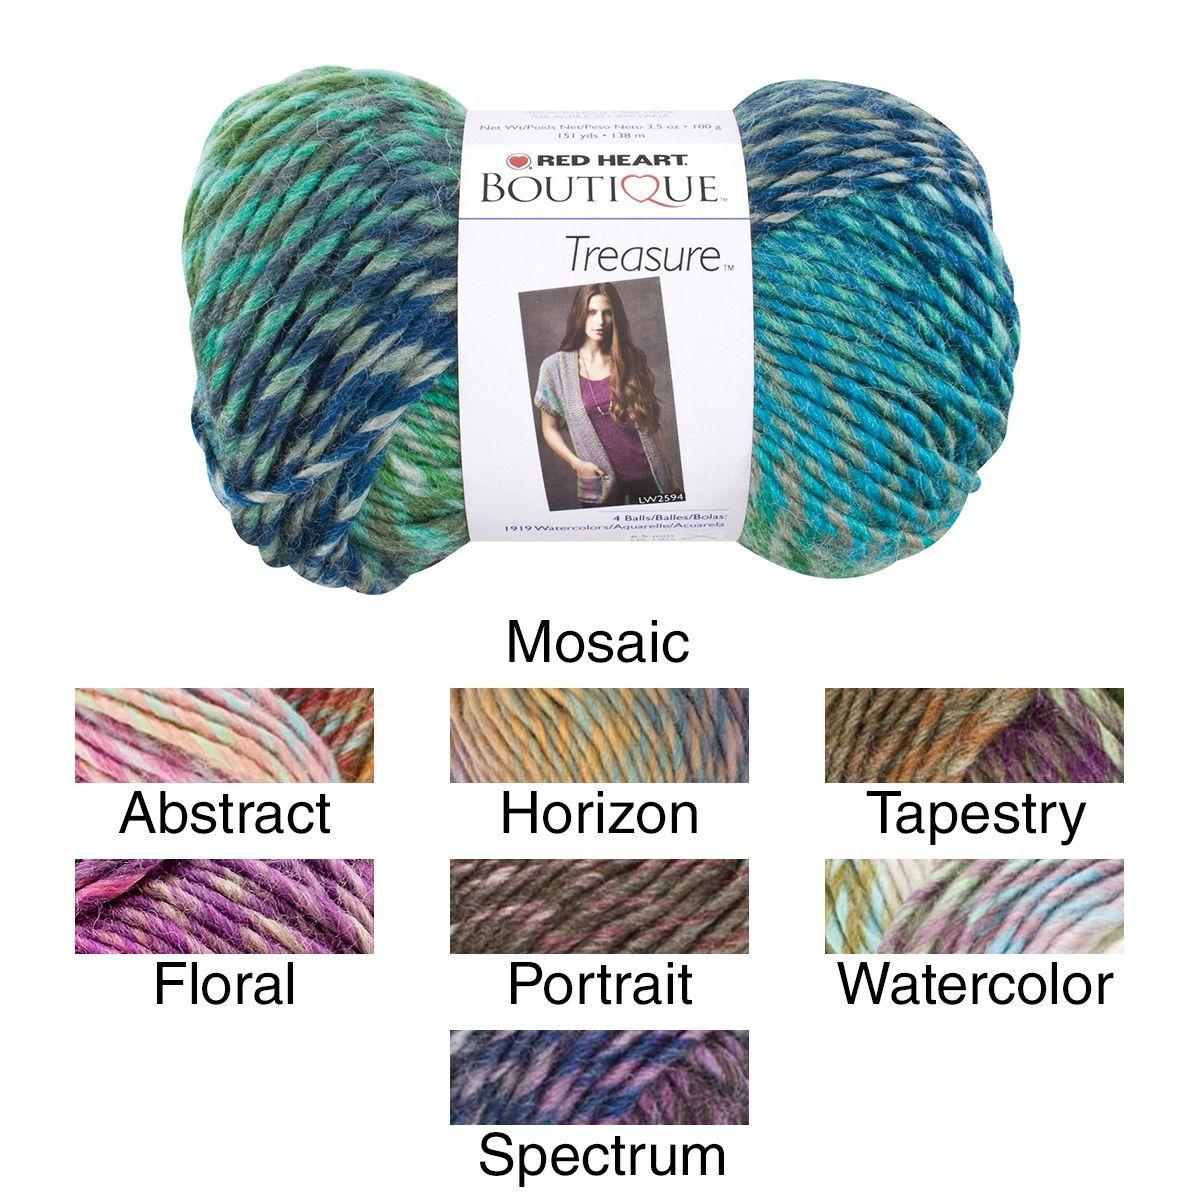 Red Heart Boutique Treasure Yarn | Fiber, Wool, Yarn, Fabric ...